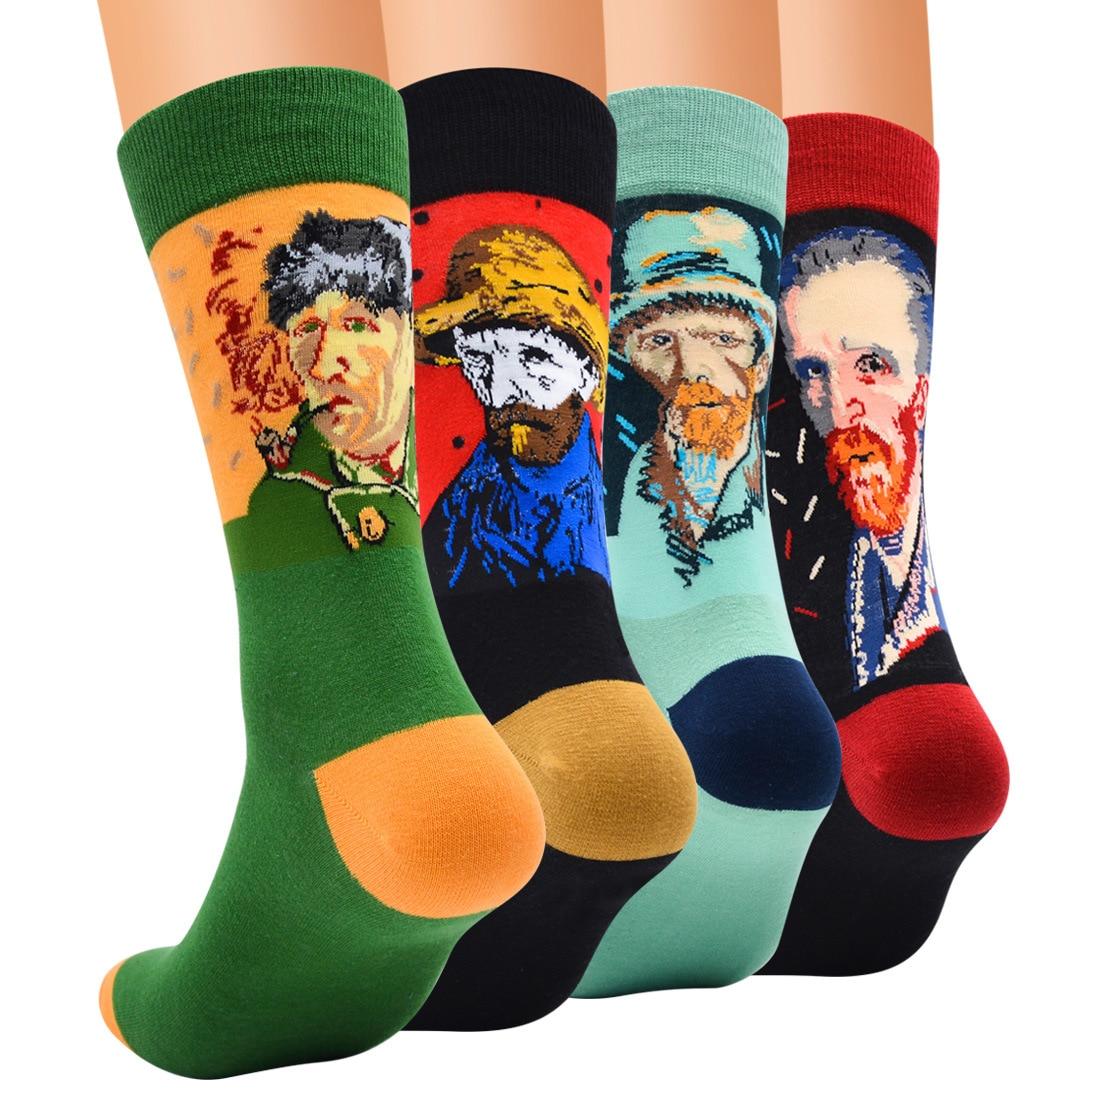 Vintage Men Socks Art Painting Cartoon Funny Socks Men Cotton Harajuku Novelty Long Tube Sokken Colored Happy Skate Socks BOC017